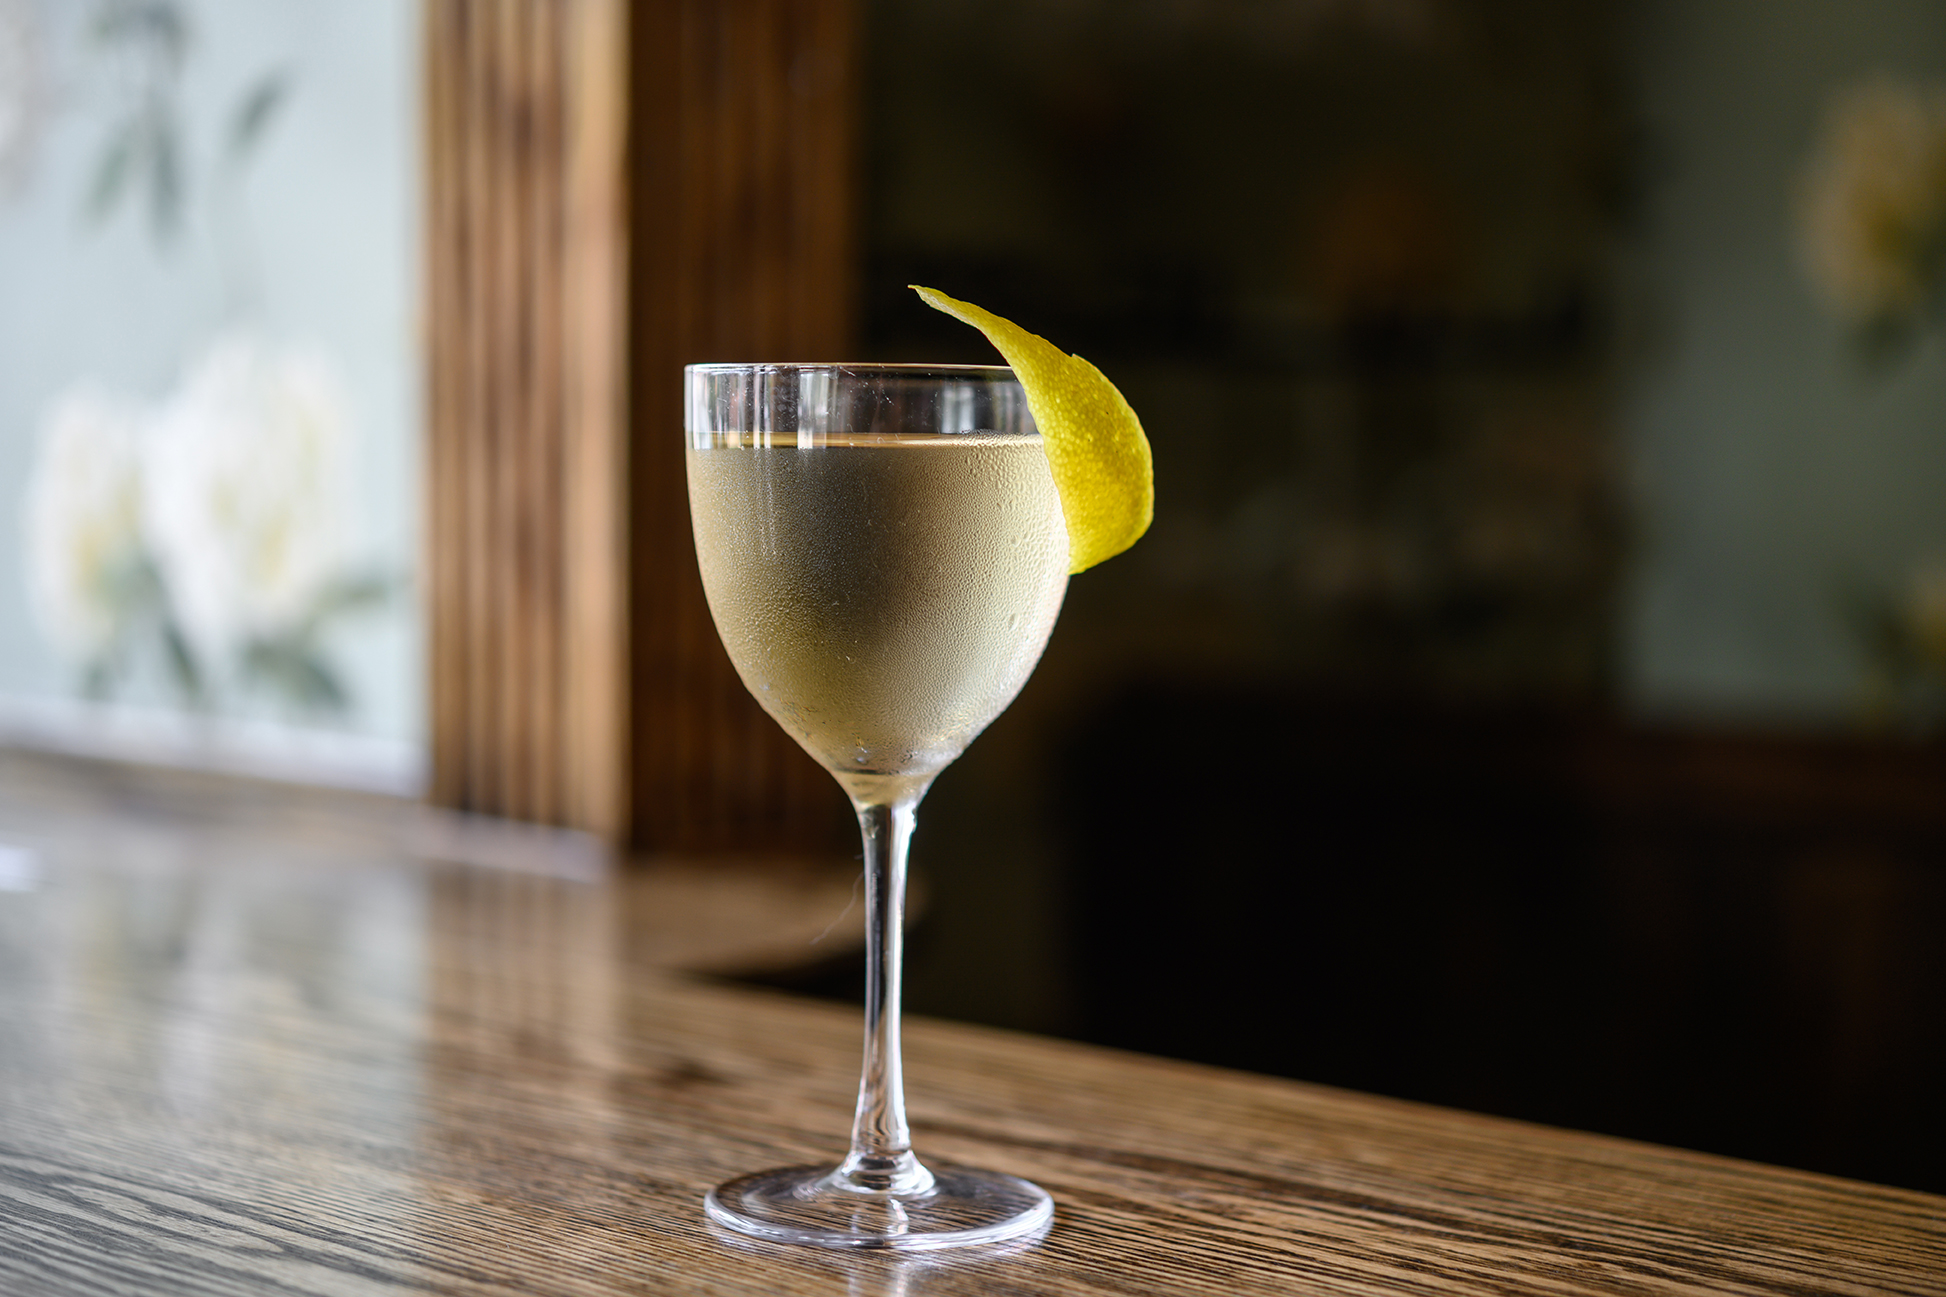 Redhook-Tavern-cocktailwithlemontwist.jpg